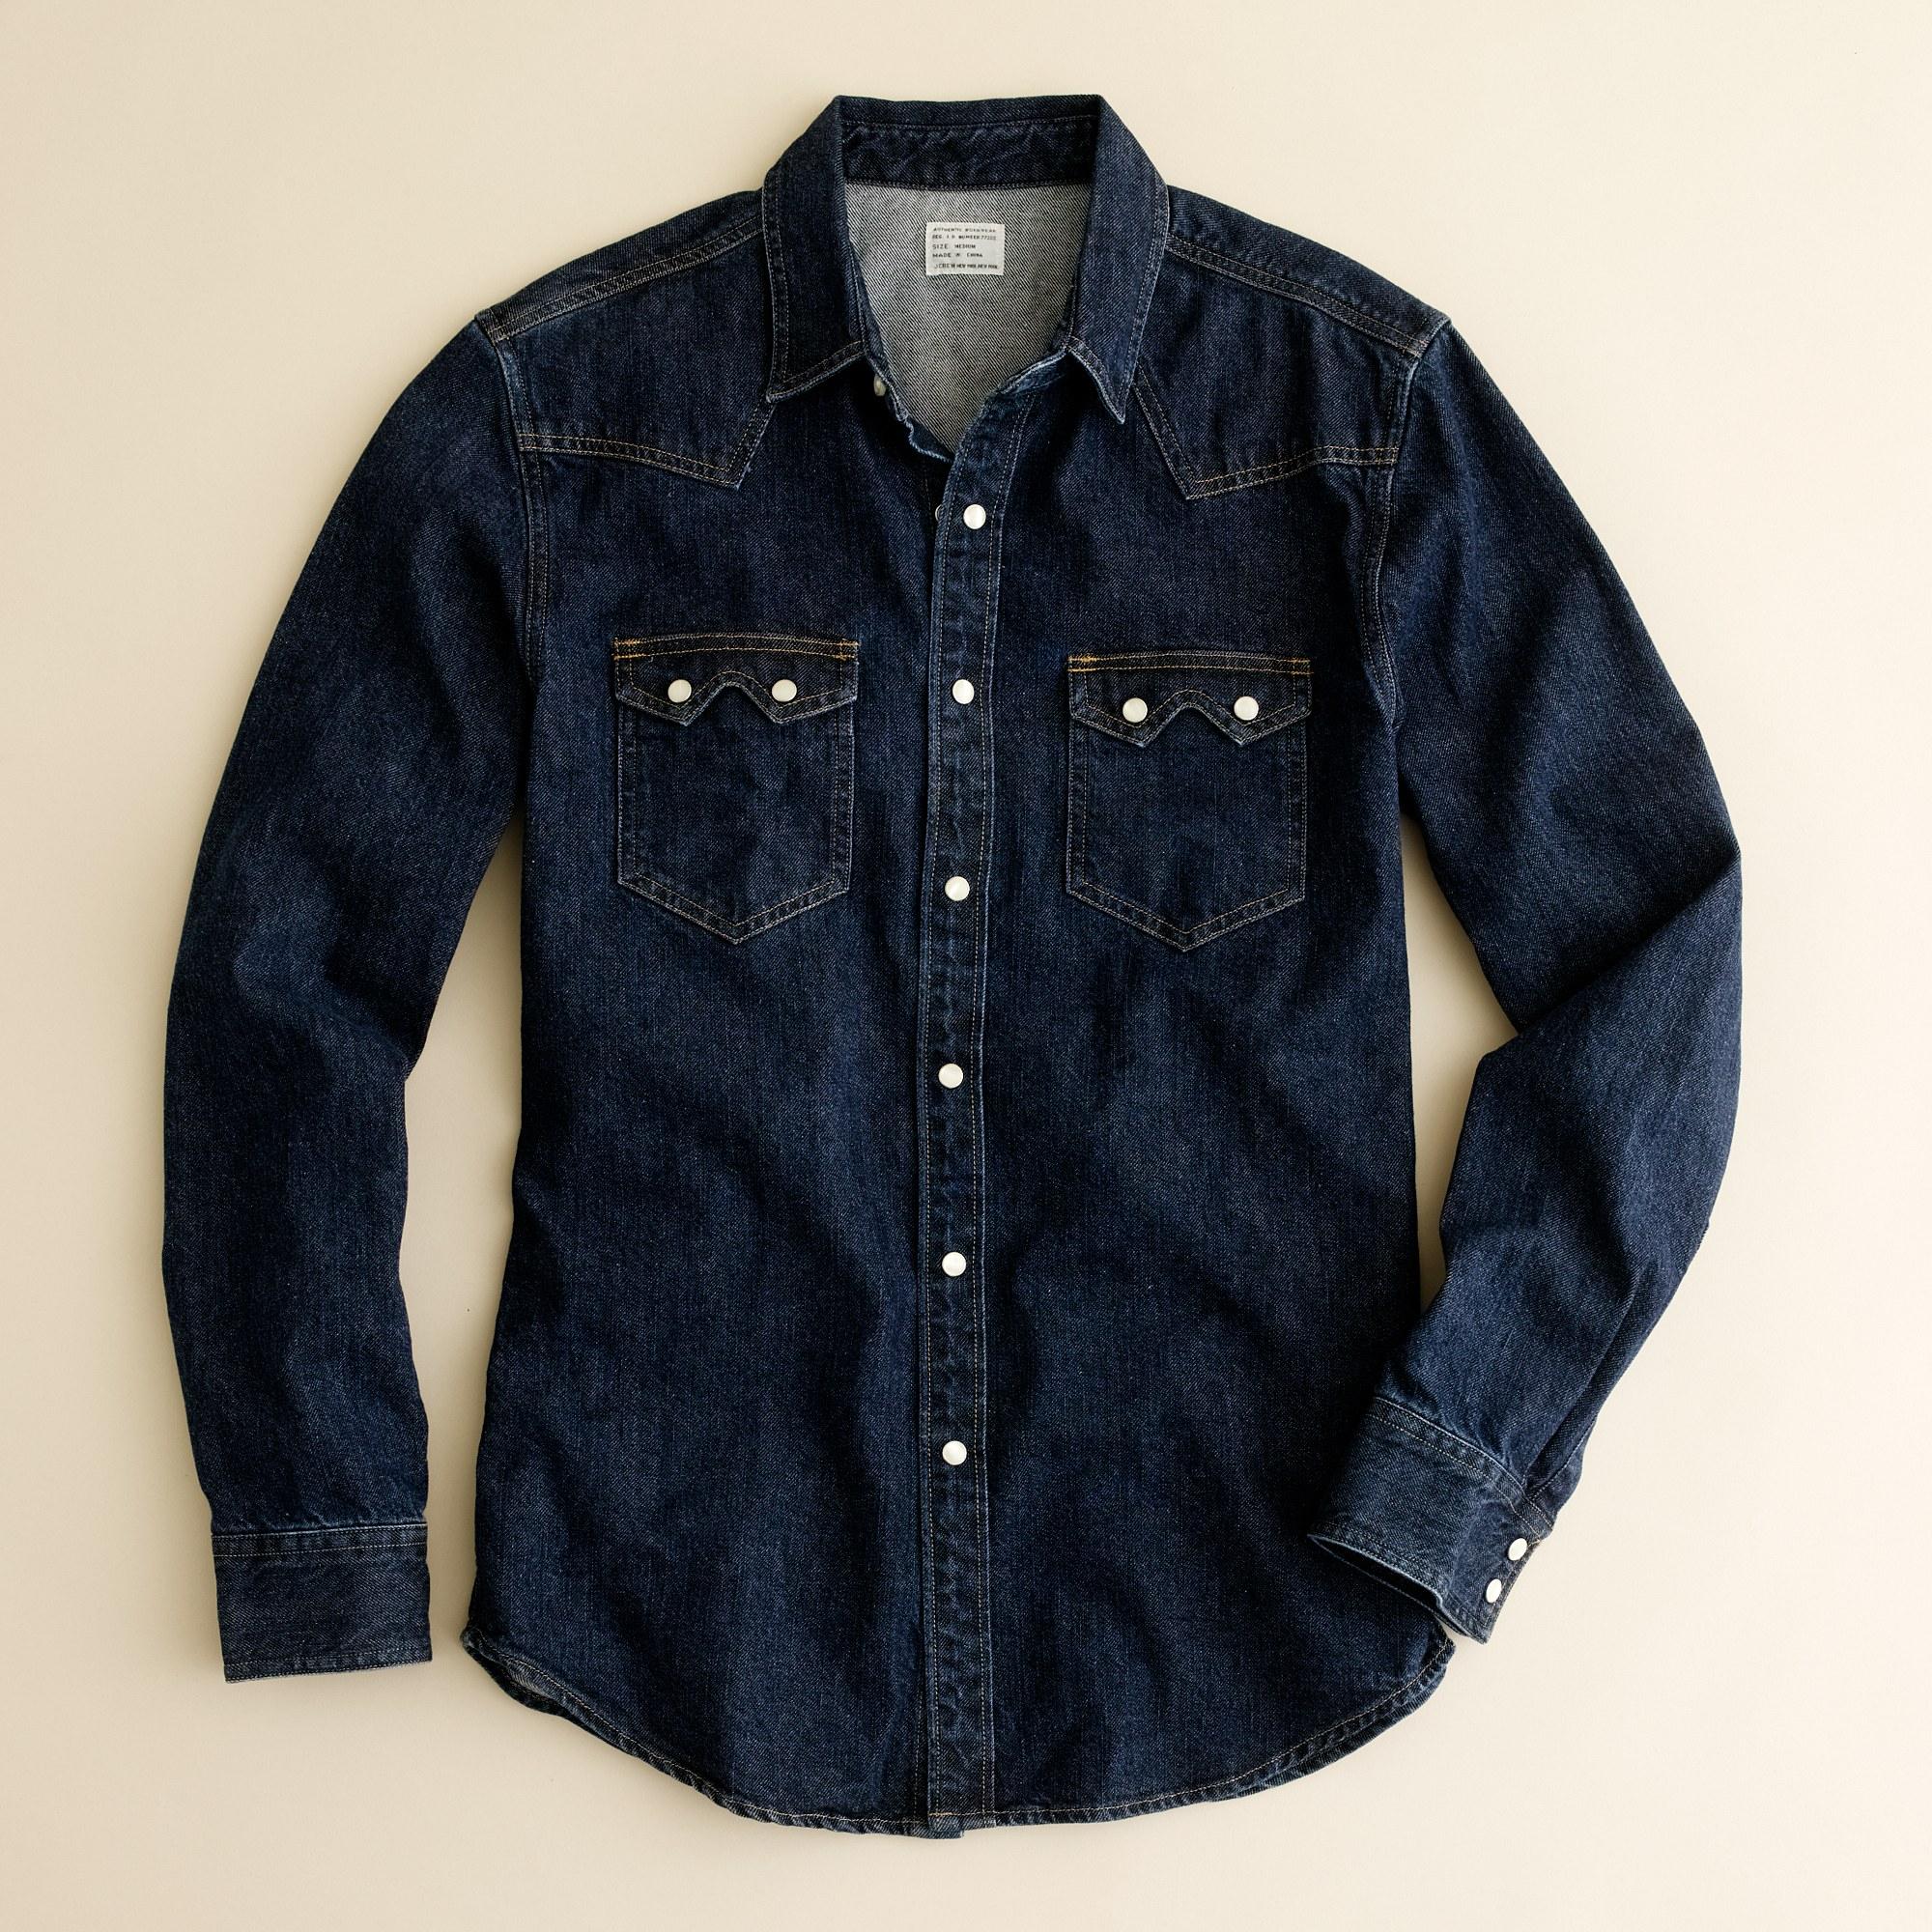 Indigo Denim Western Shirt In Blue For Men Indigo